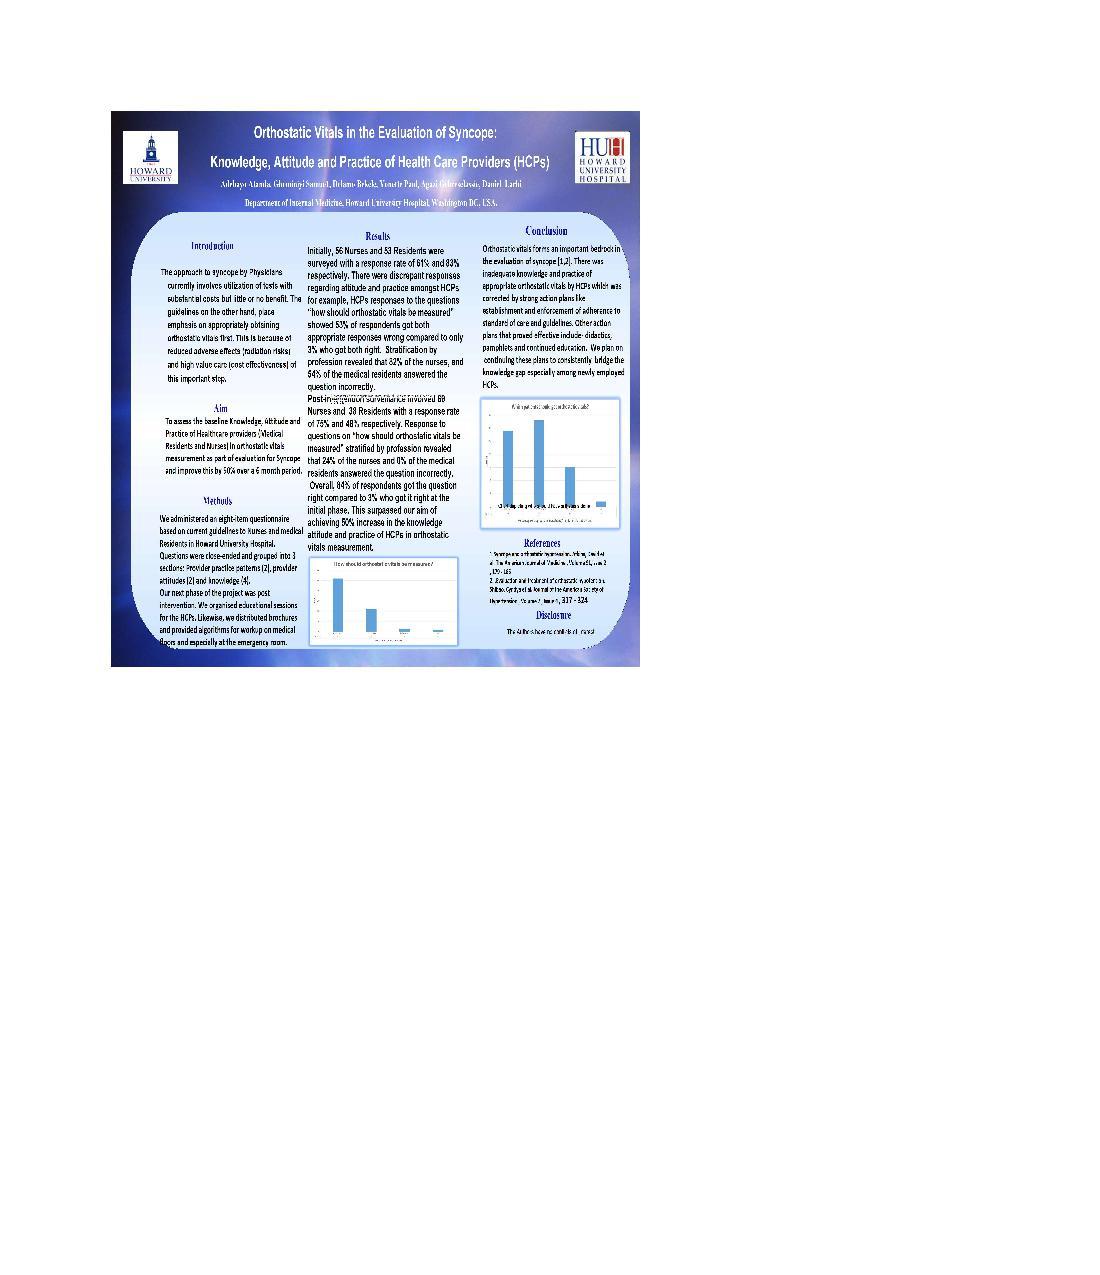 Atanda Orthostatic Vitals